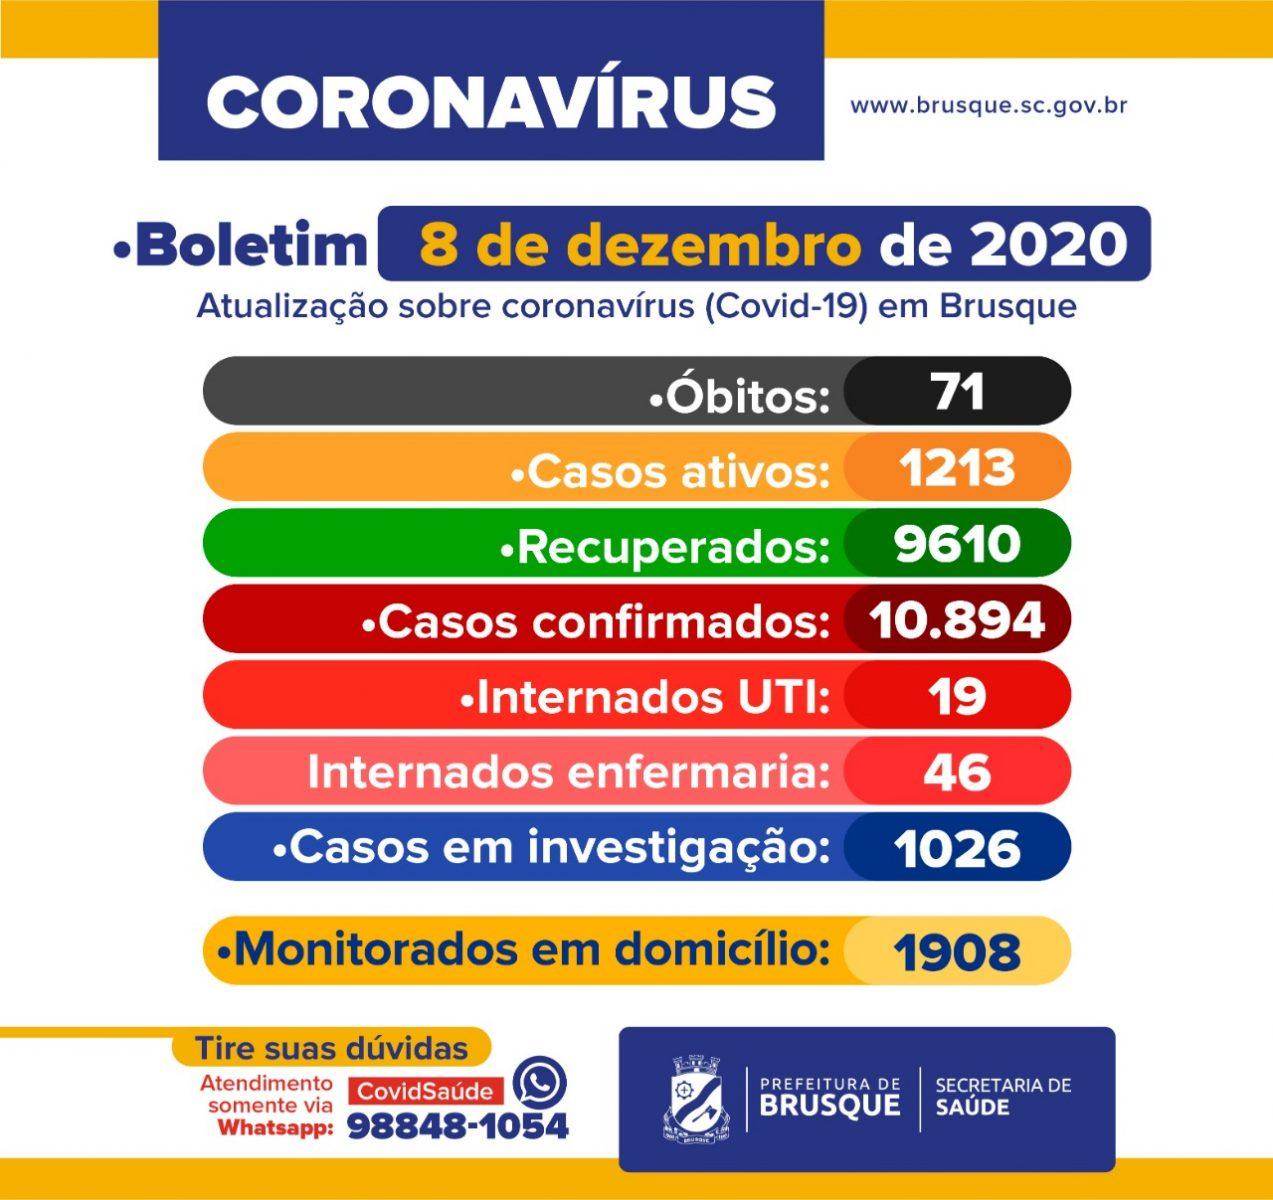 Covid-19: Boletim epidemiológico de 8 de dezembro